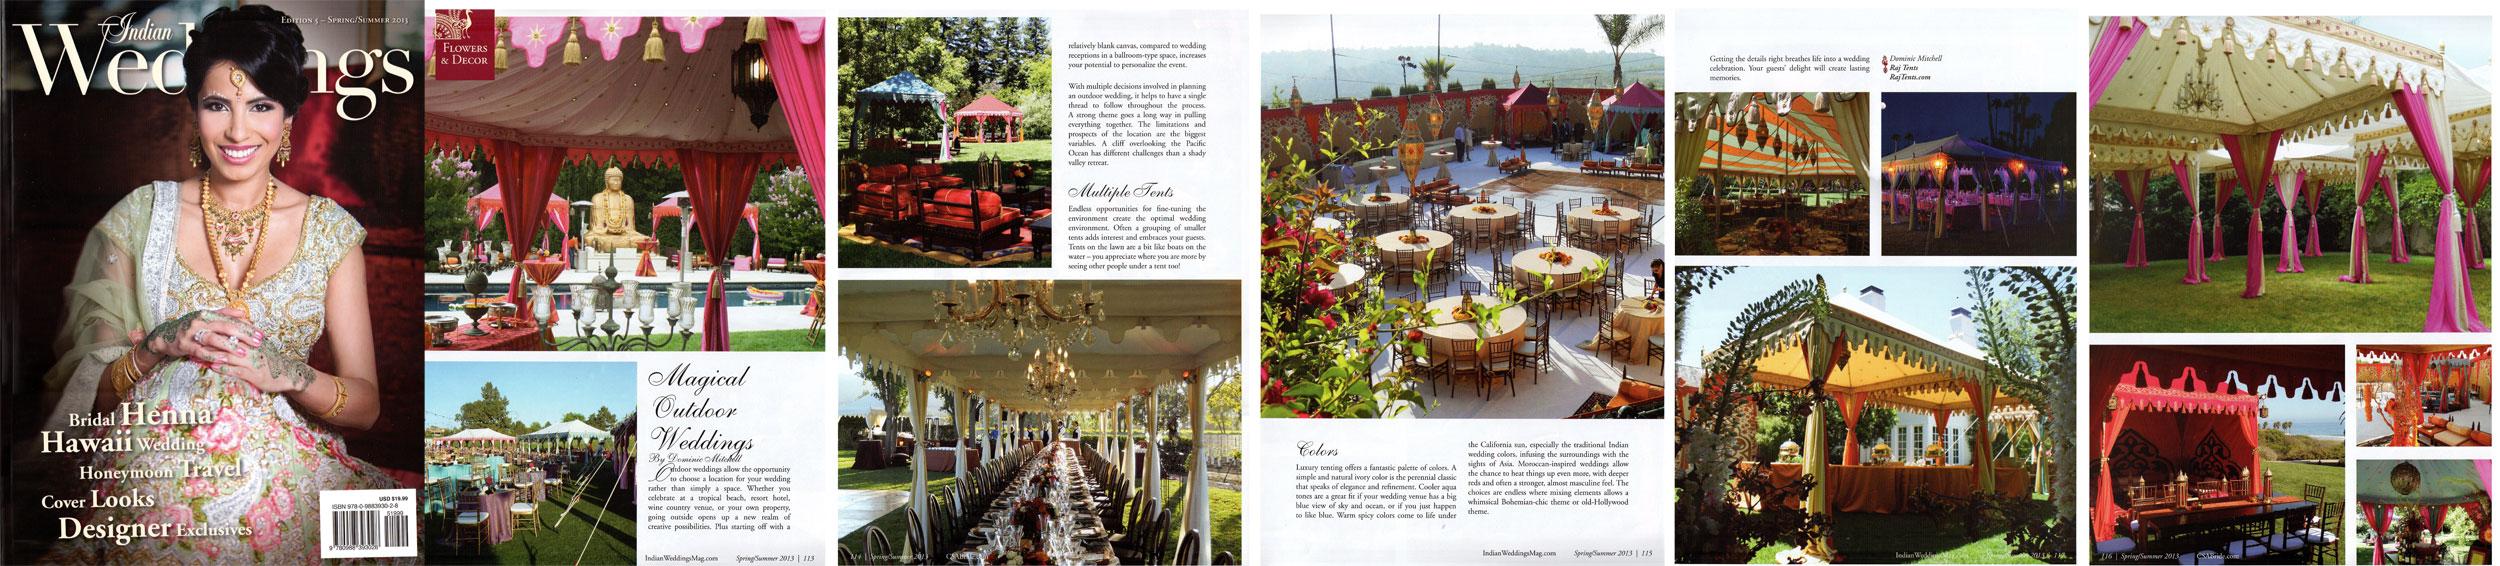 raj-tents-indian-weddings-magazine-outdoor-weddings-2013.jpg